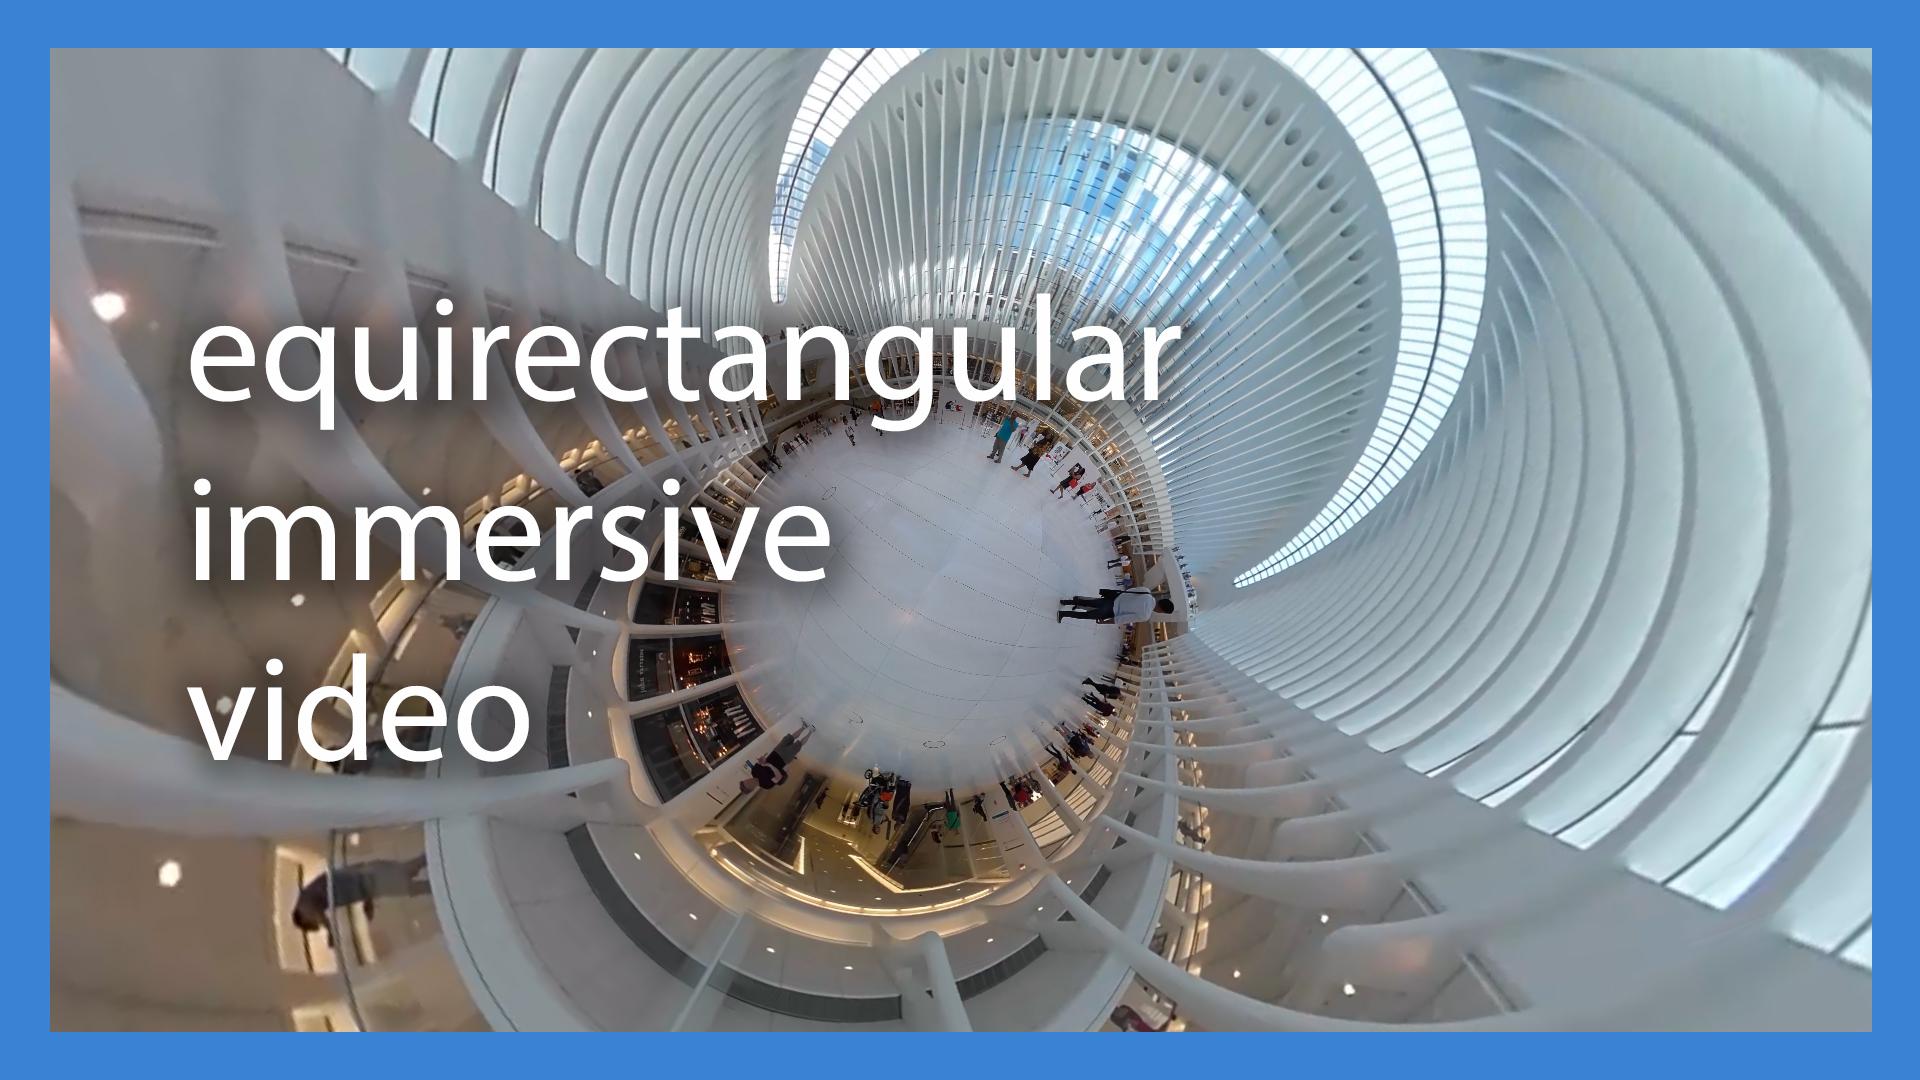 Equirectanguler Immersive Video